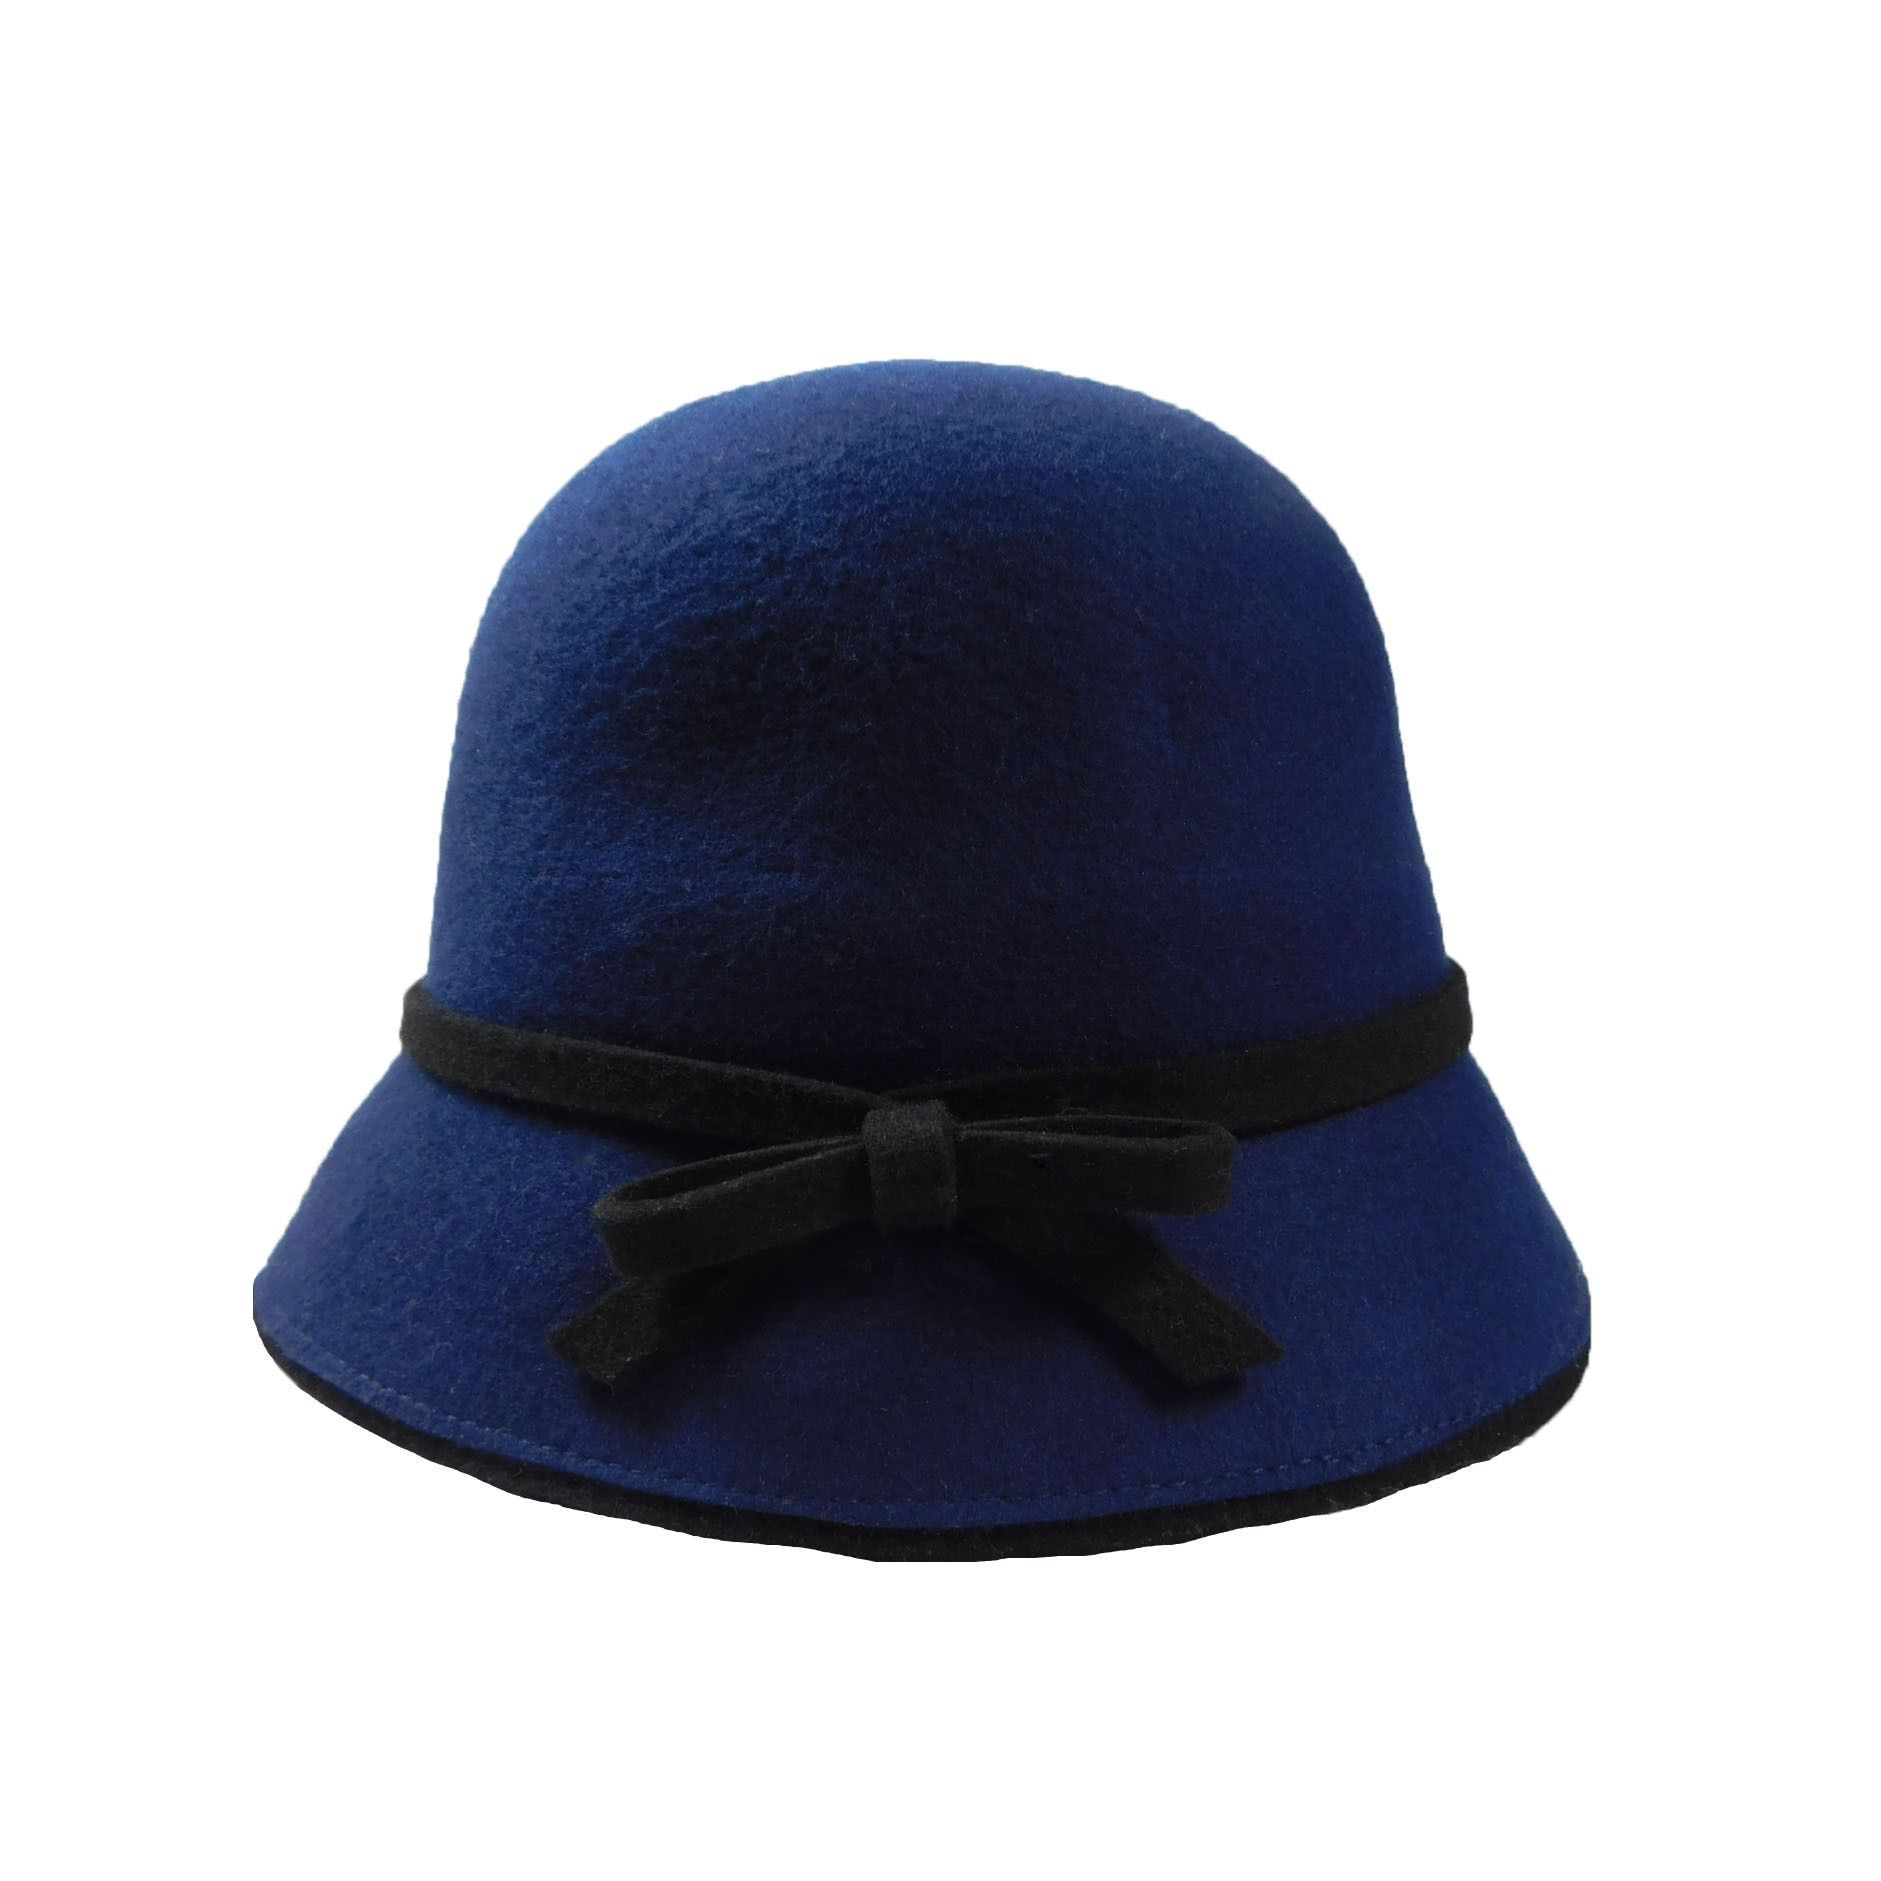 Wool Felt Cloche/Bucket Hat | Top Of The Head, Too You ...